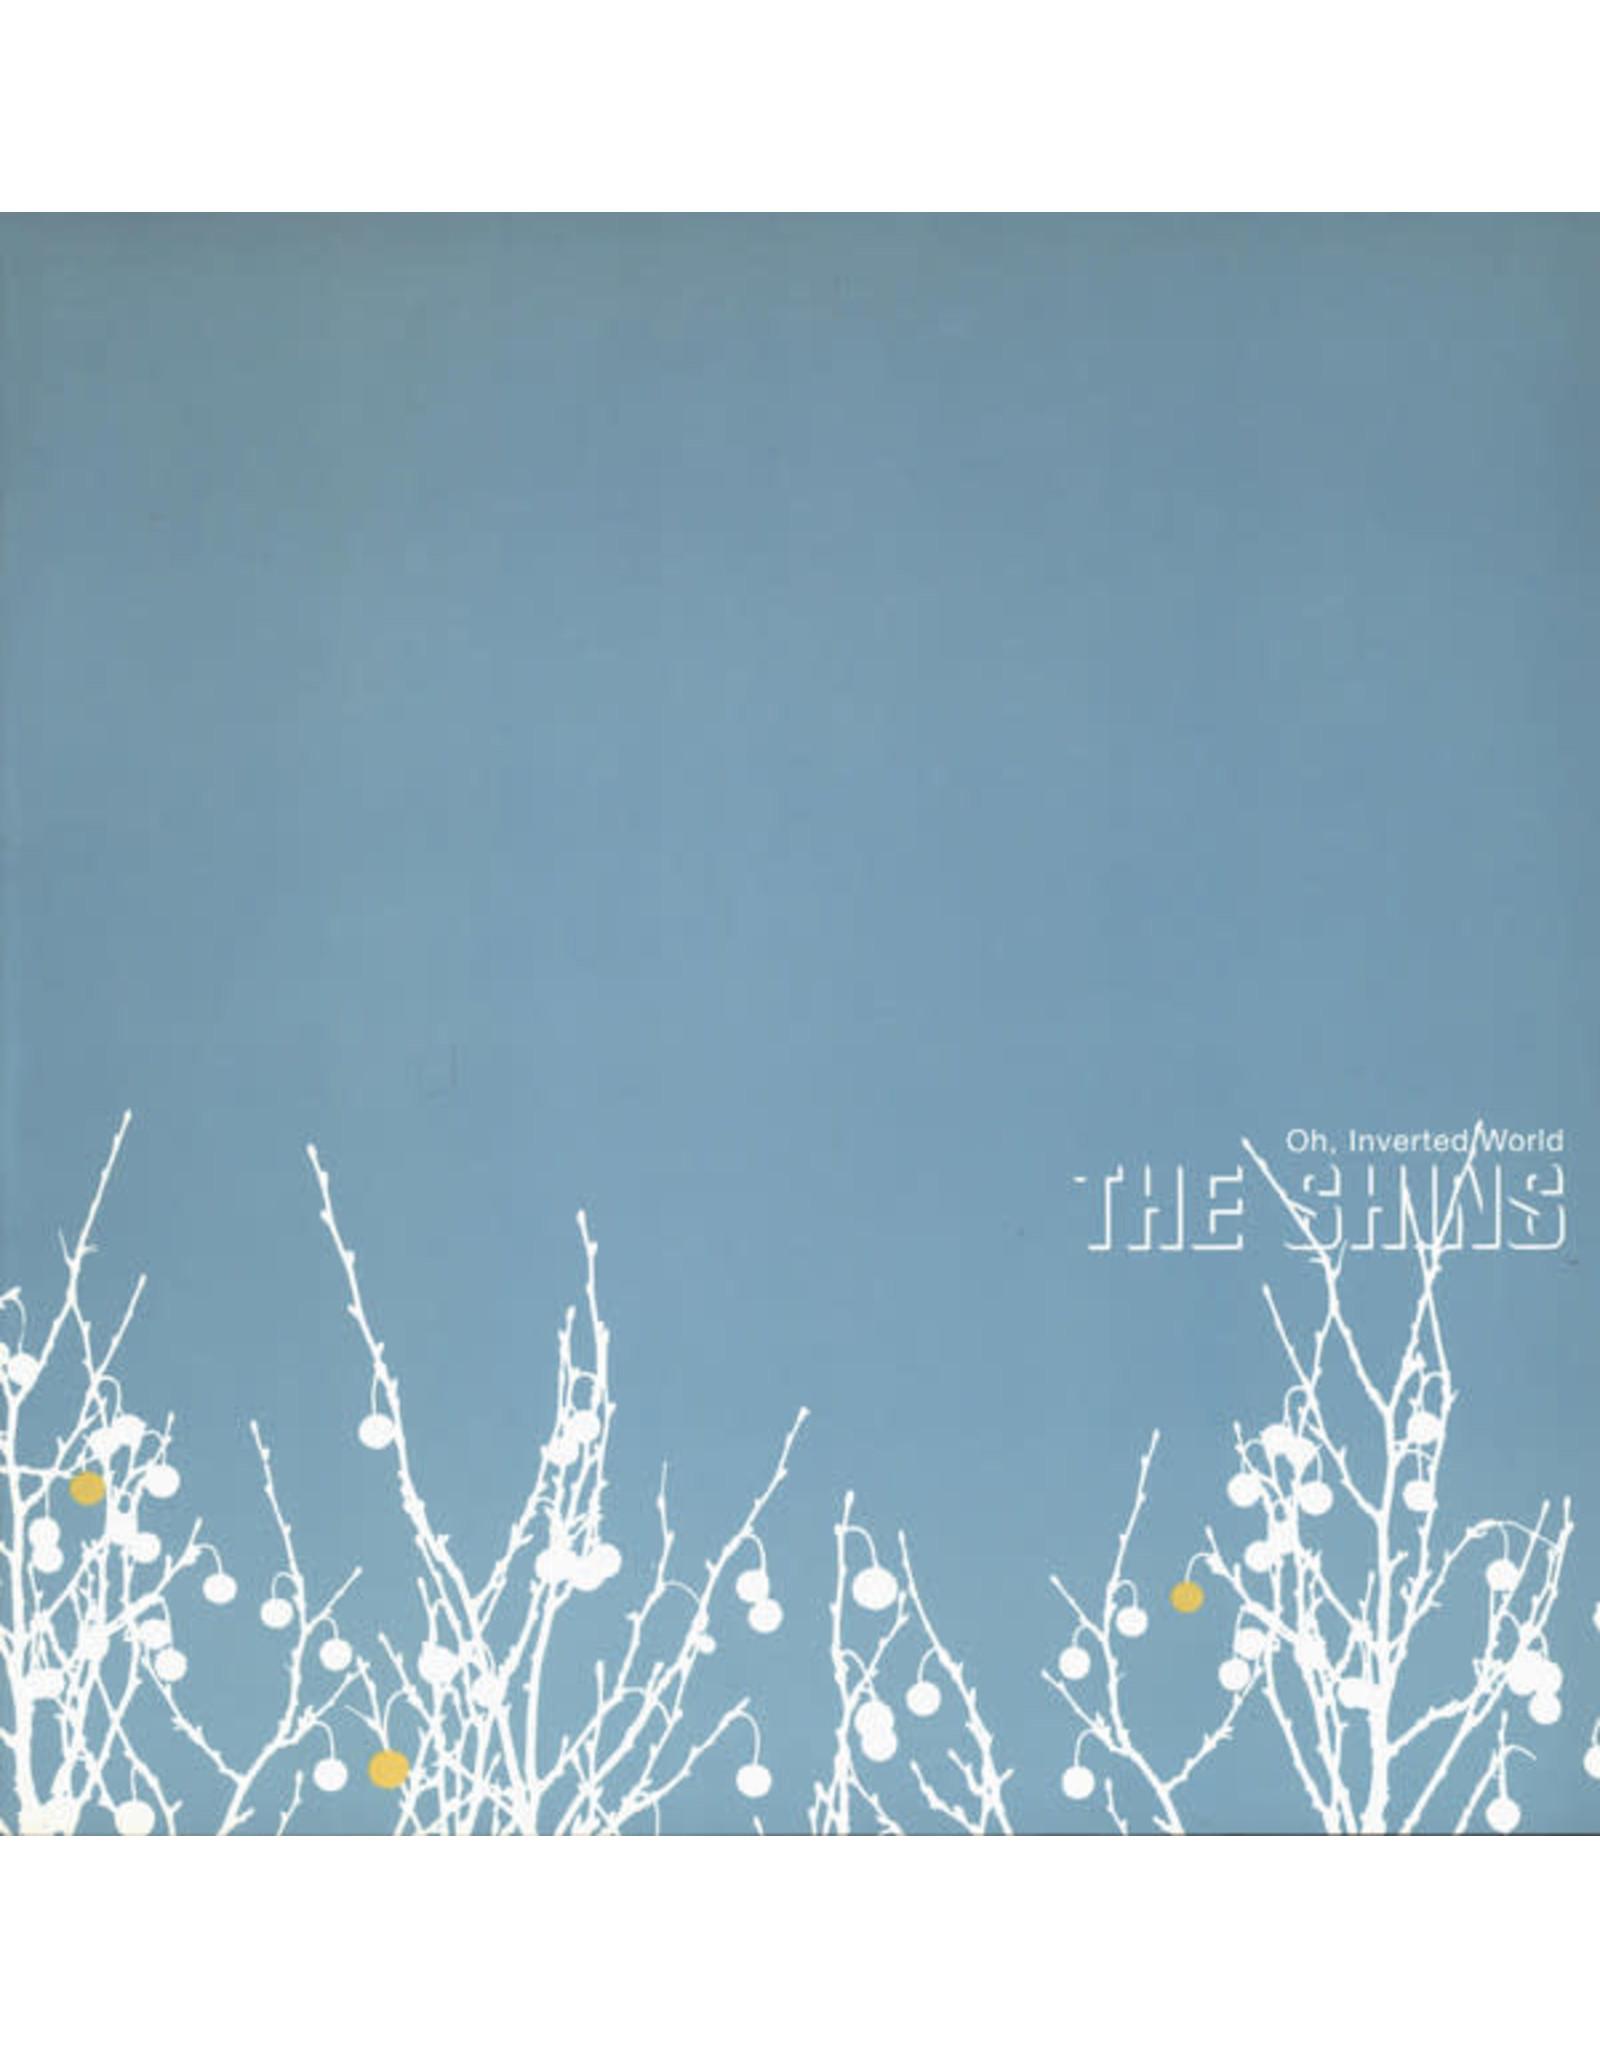 Shins - Oh, Inverted World LP